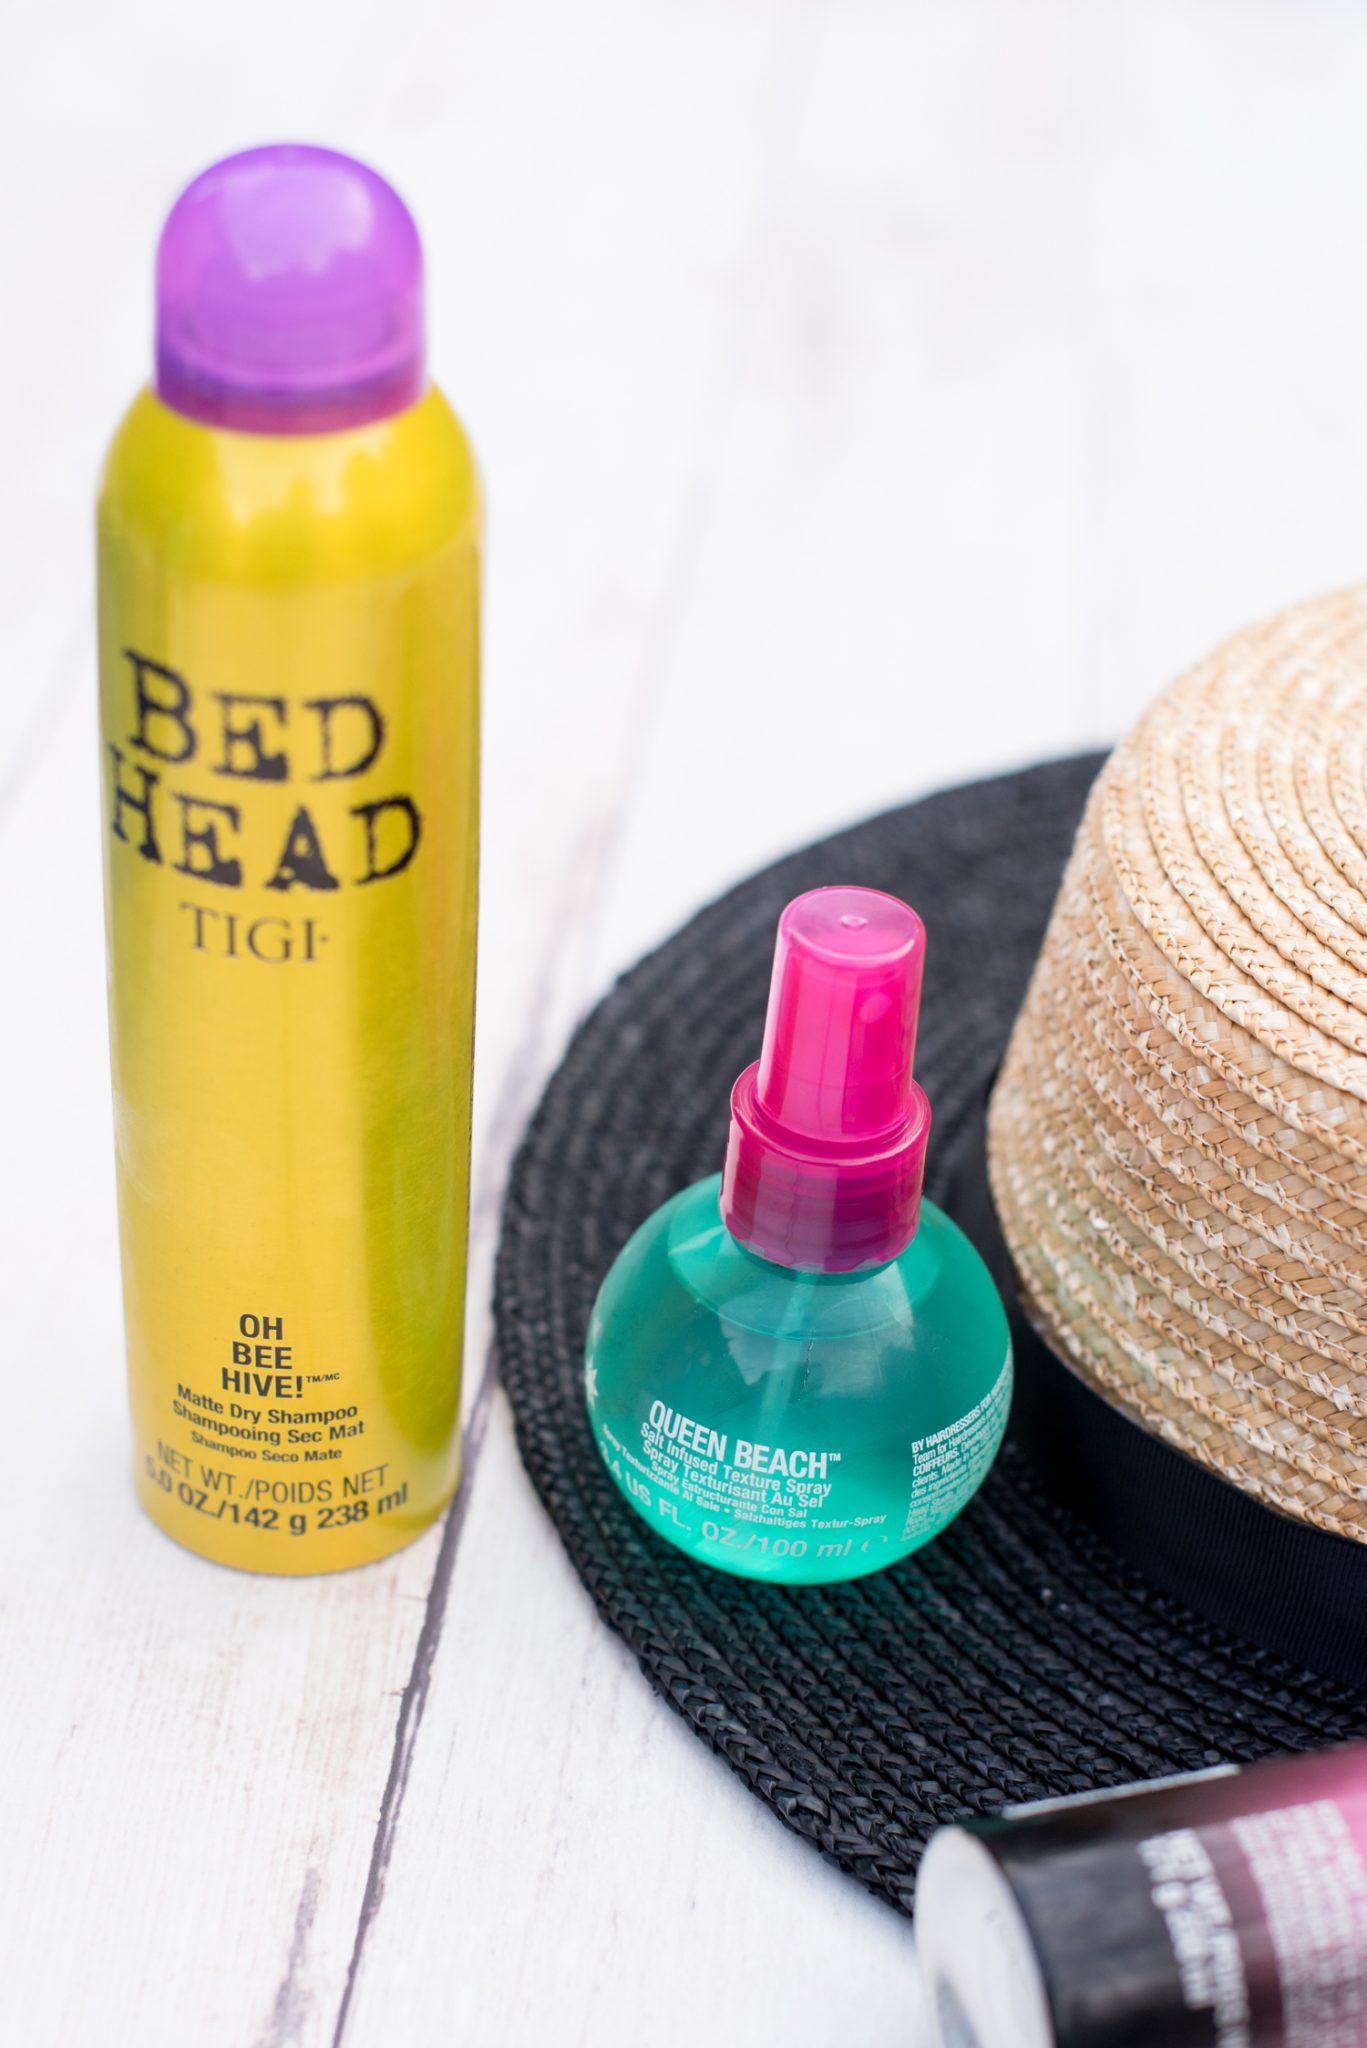 Festival Ready with Bed Head by TIGI // Miss Molly Moon